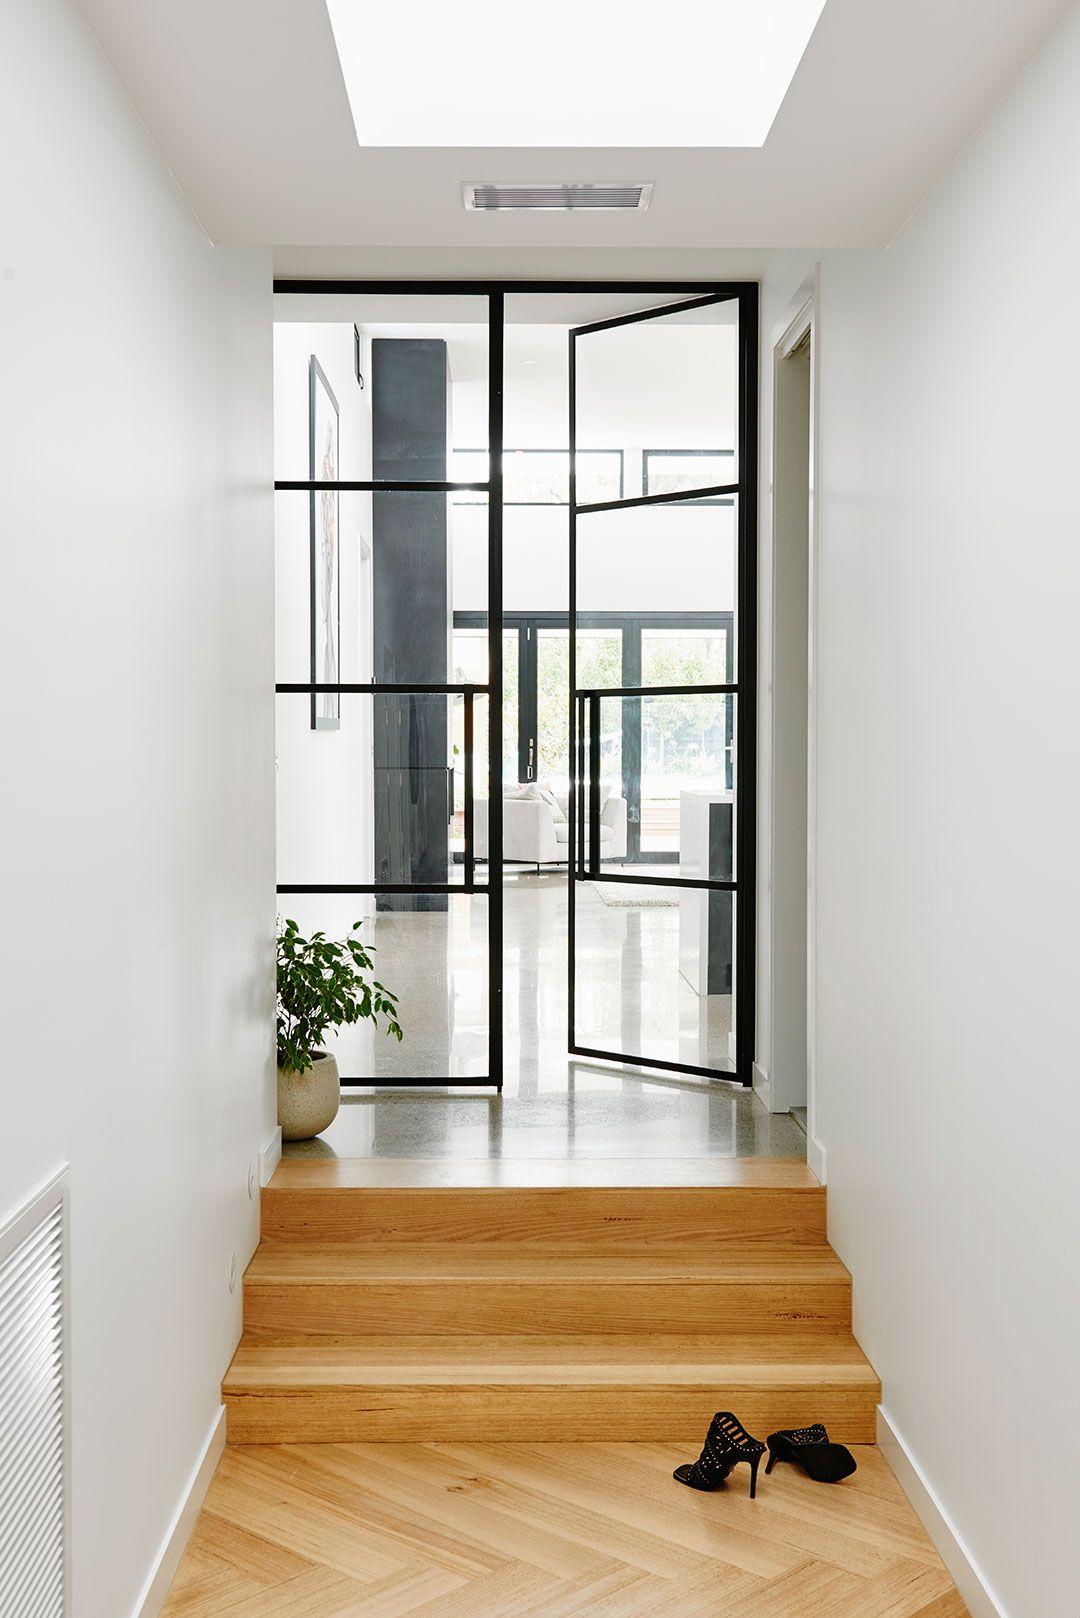 Bedroom Hdb Furniture: Image By Vanice Teo On HDB Ideas